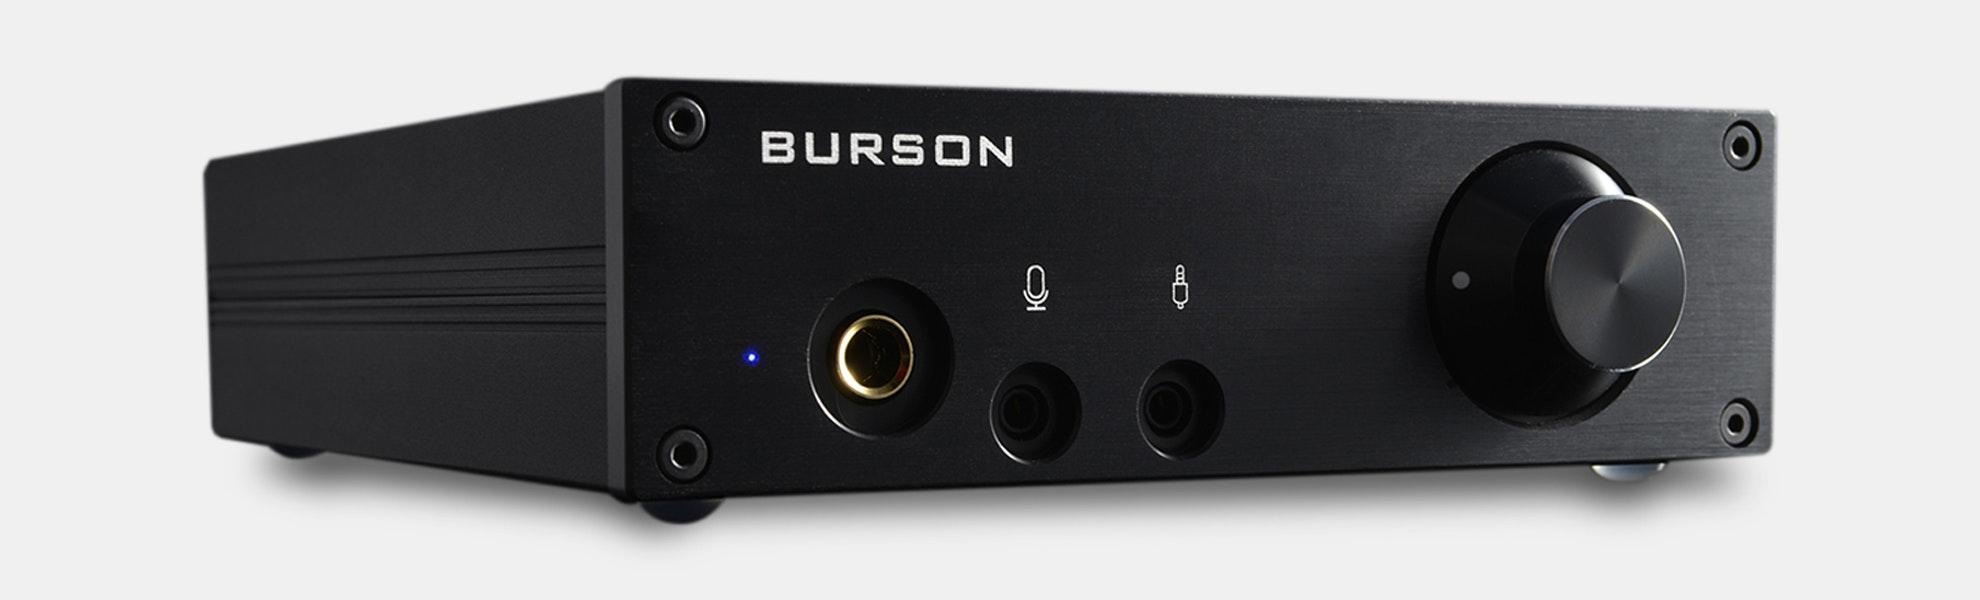 Burson Fun Headphone Amplifier